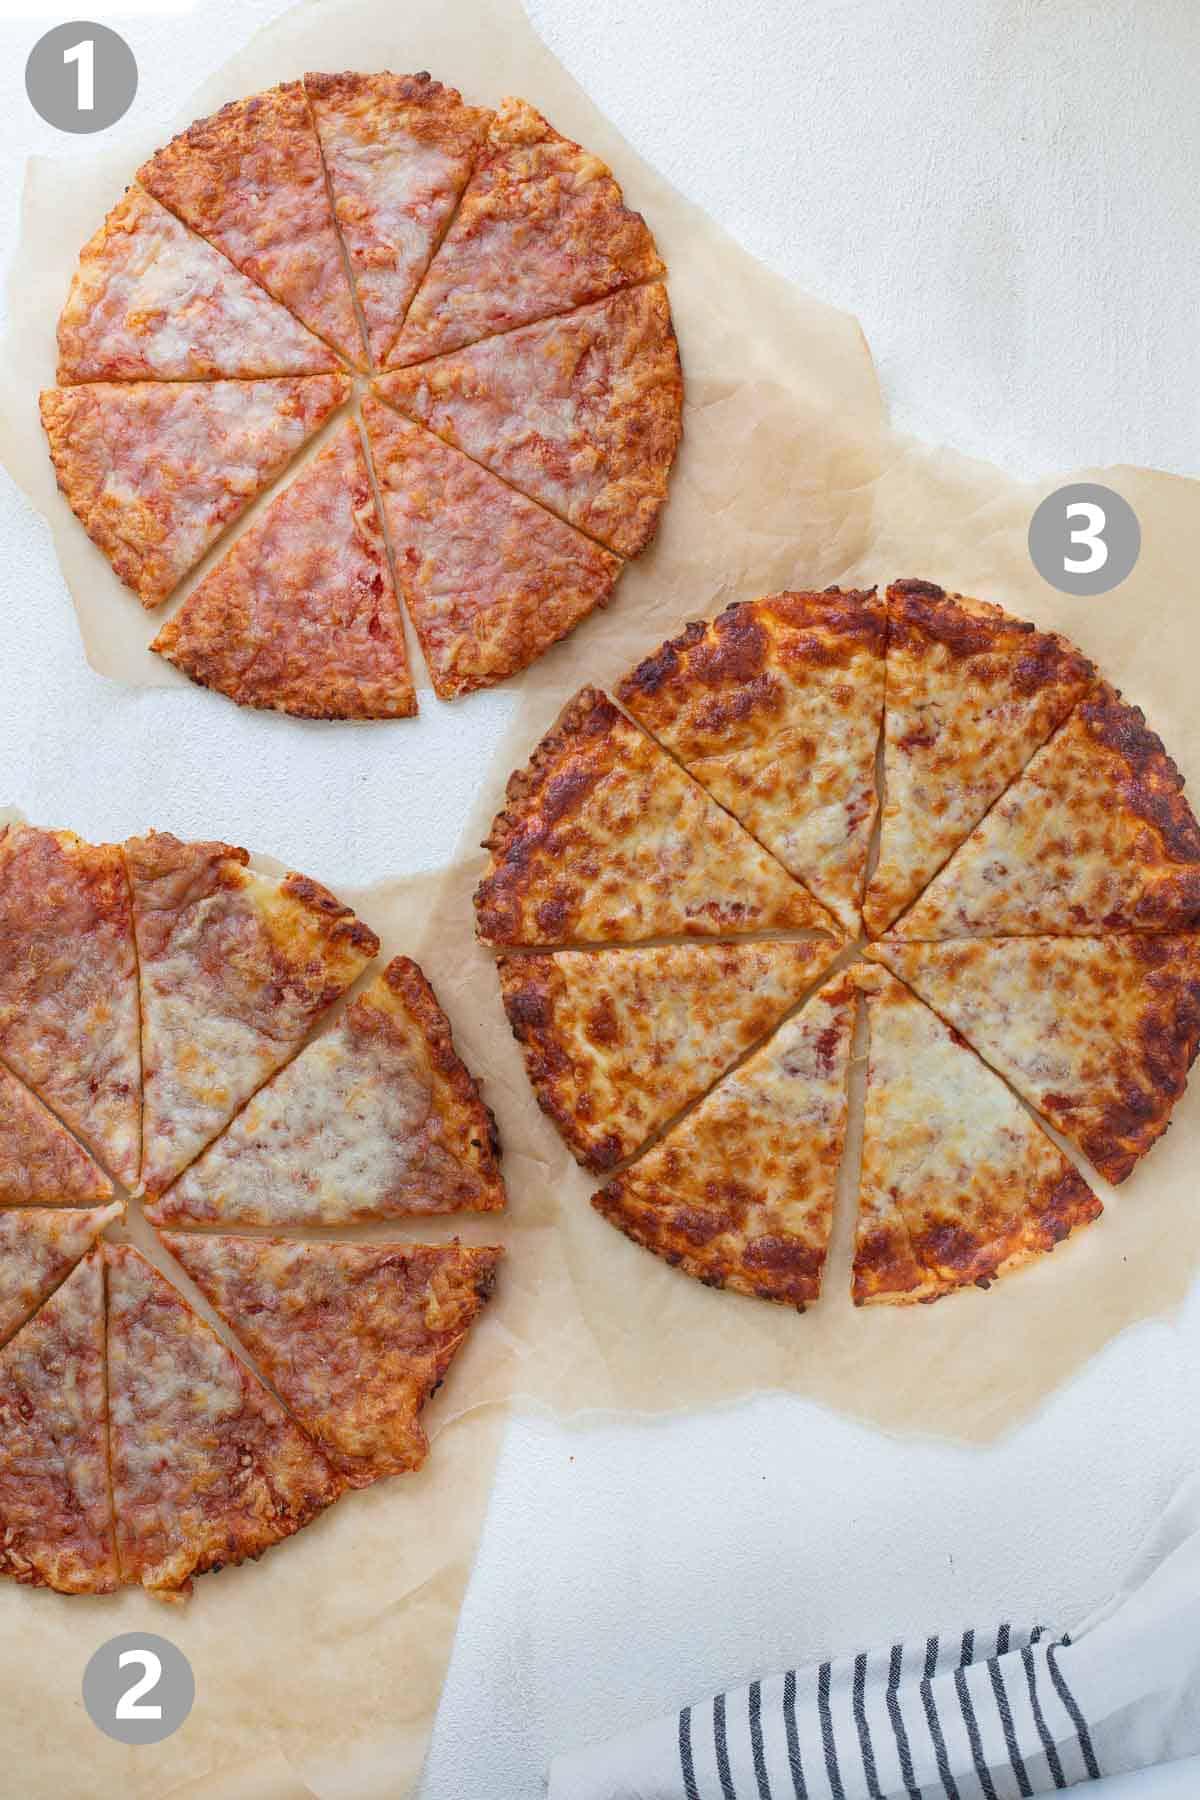 3 types of gluten-free pizza for taste test